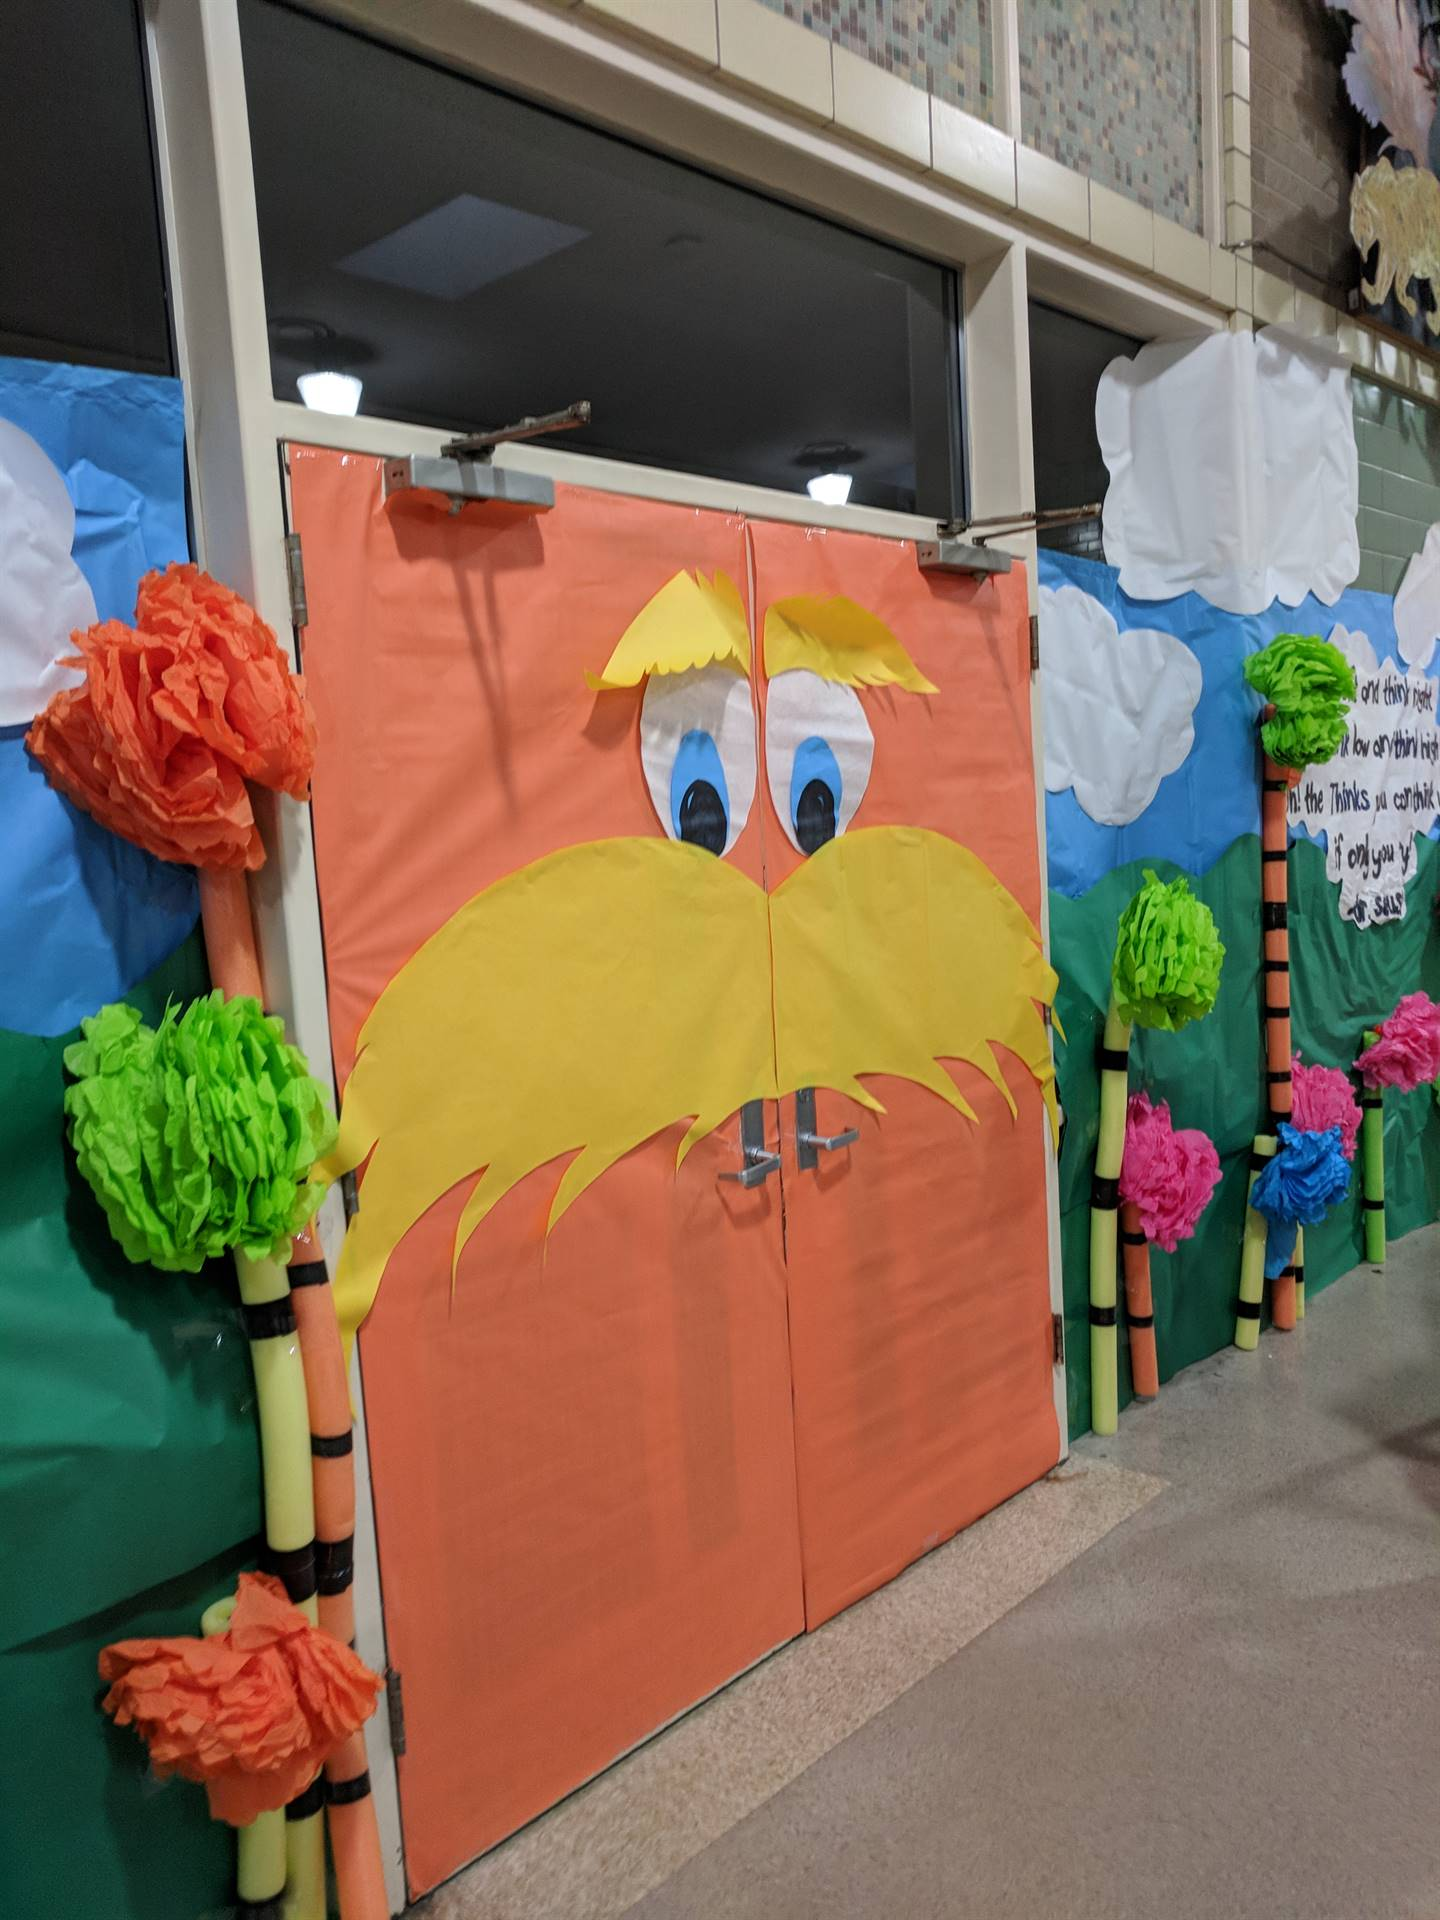 Set up for Dr. Seuss week at NES!